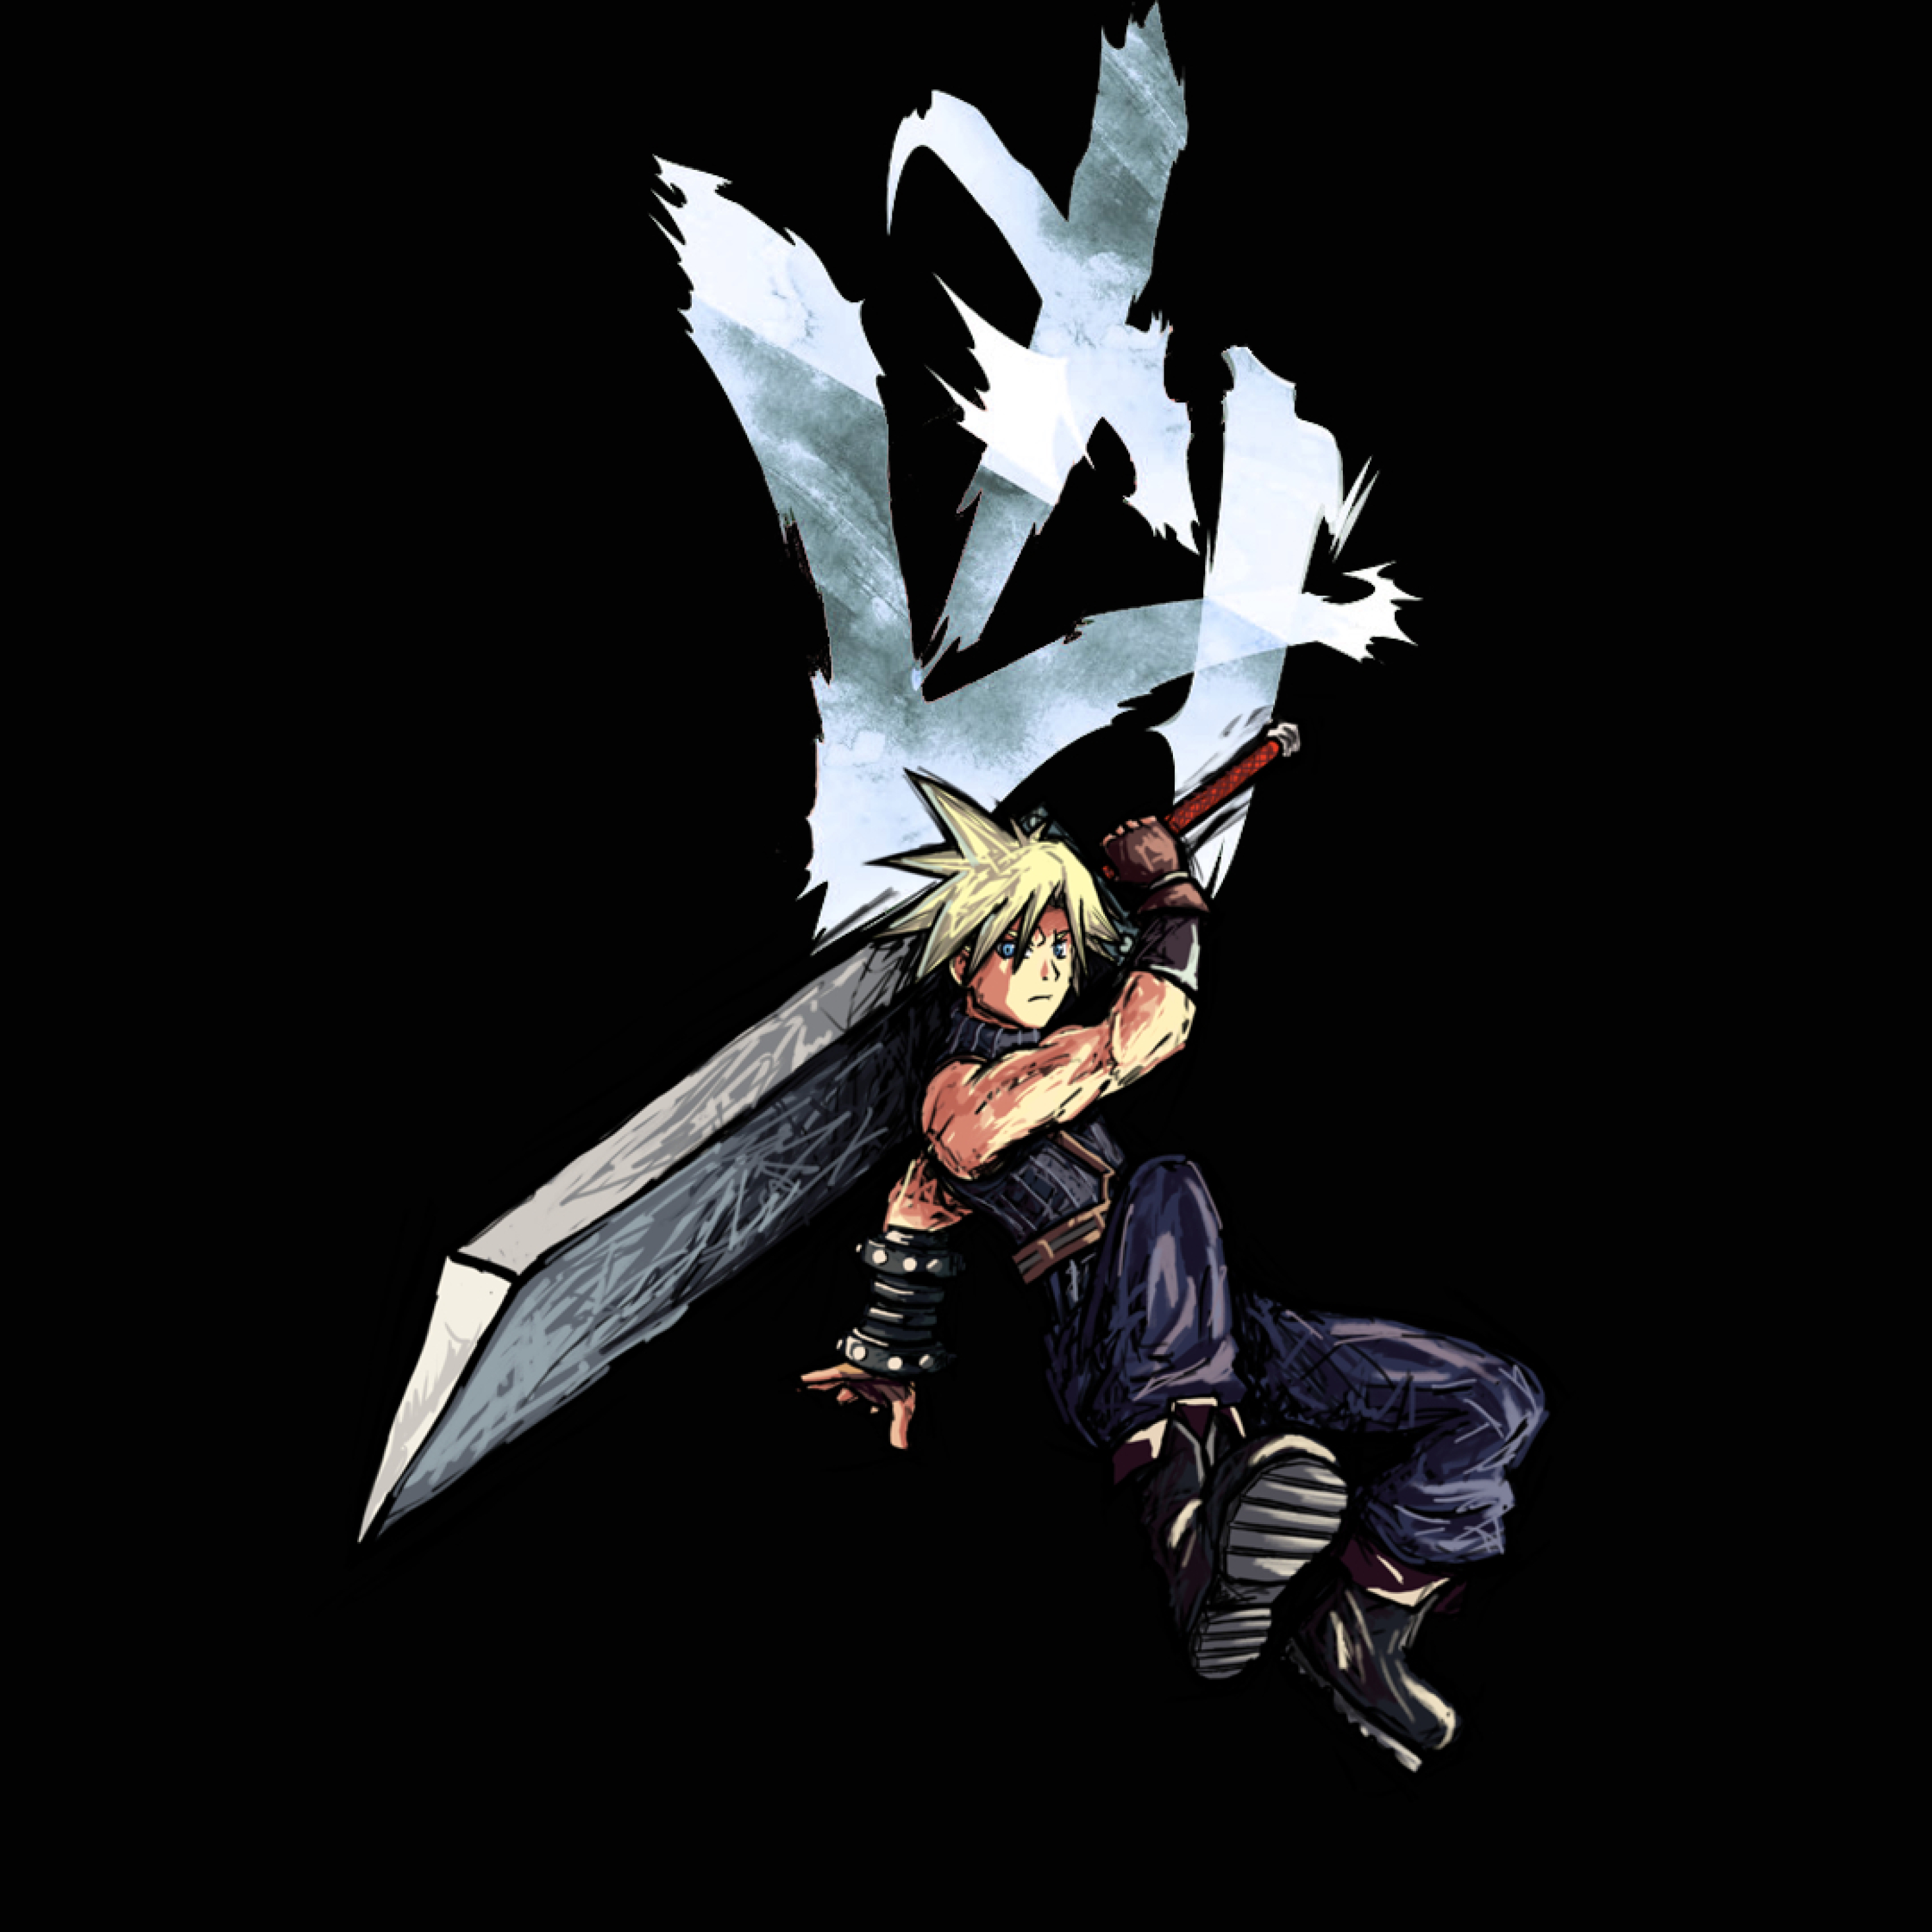 2932x2932 Cloud Strife Final Fantasy Ipad Pro Retina Display